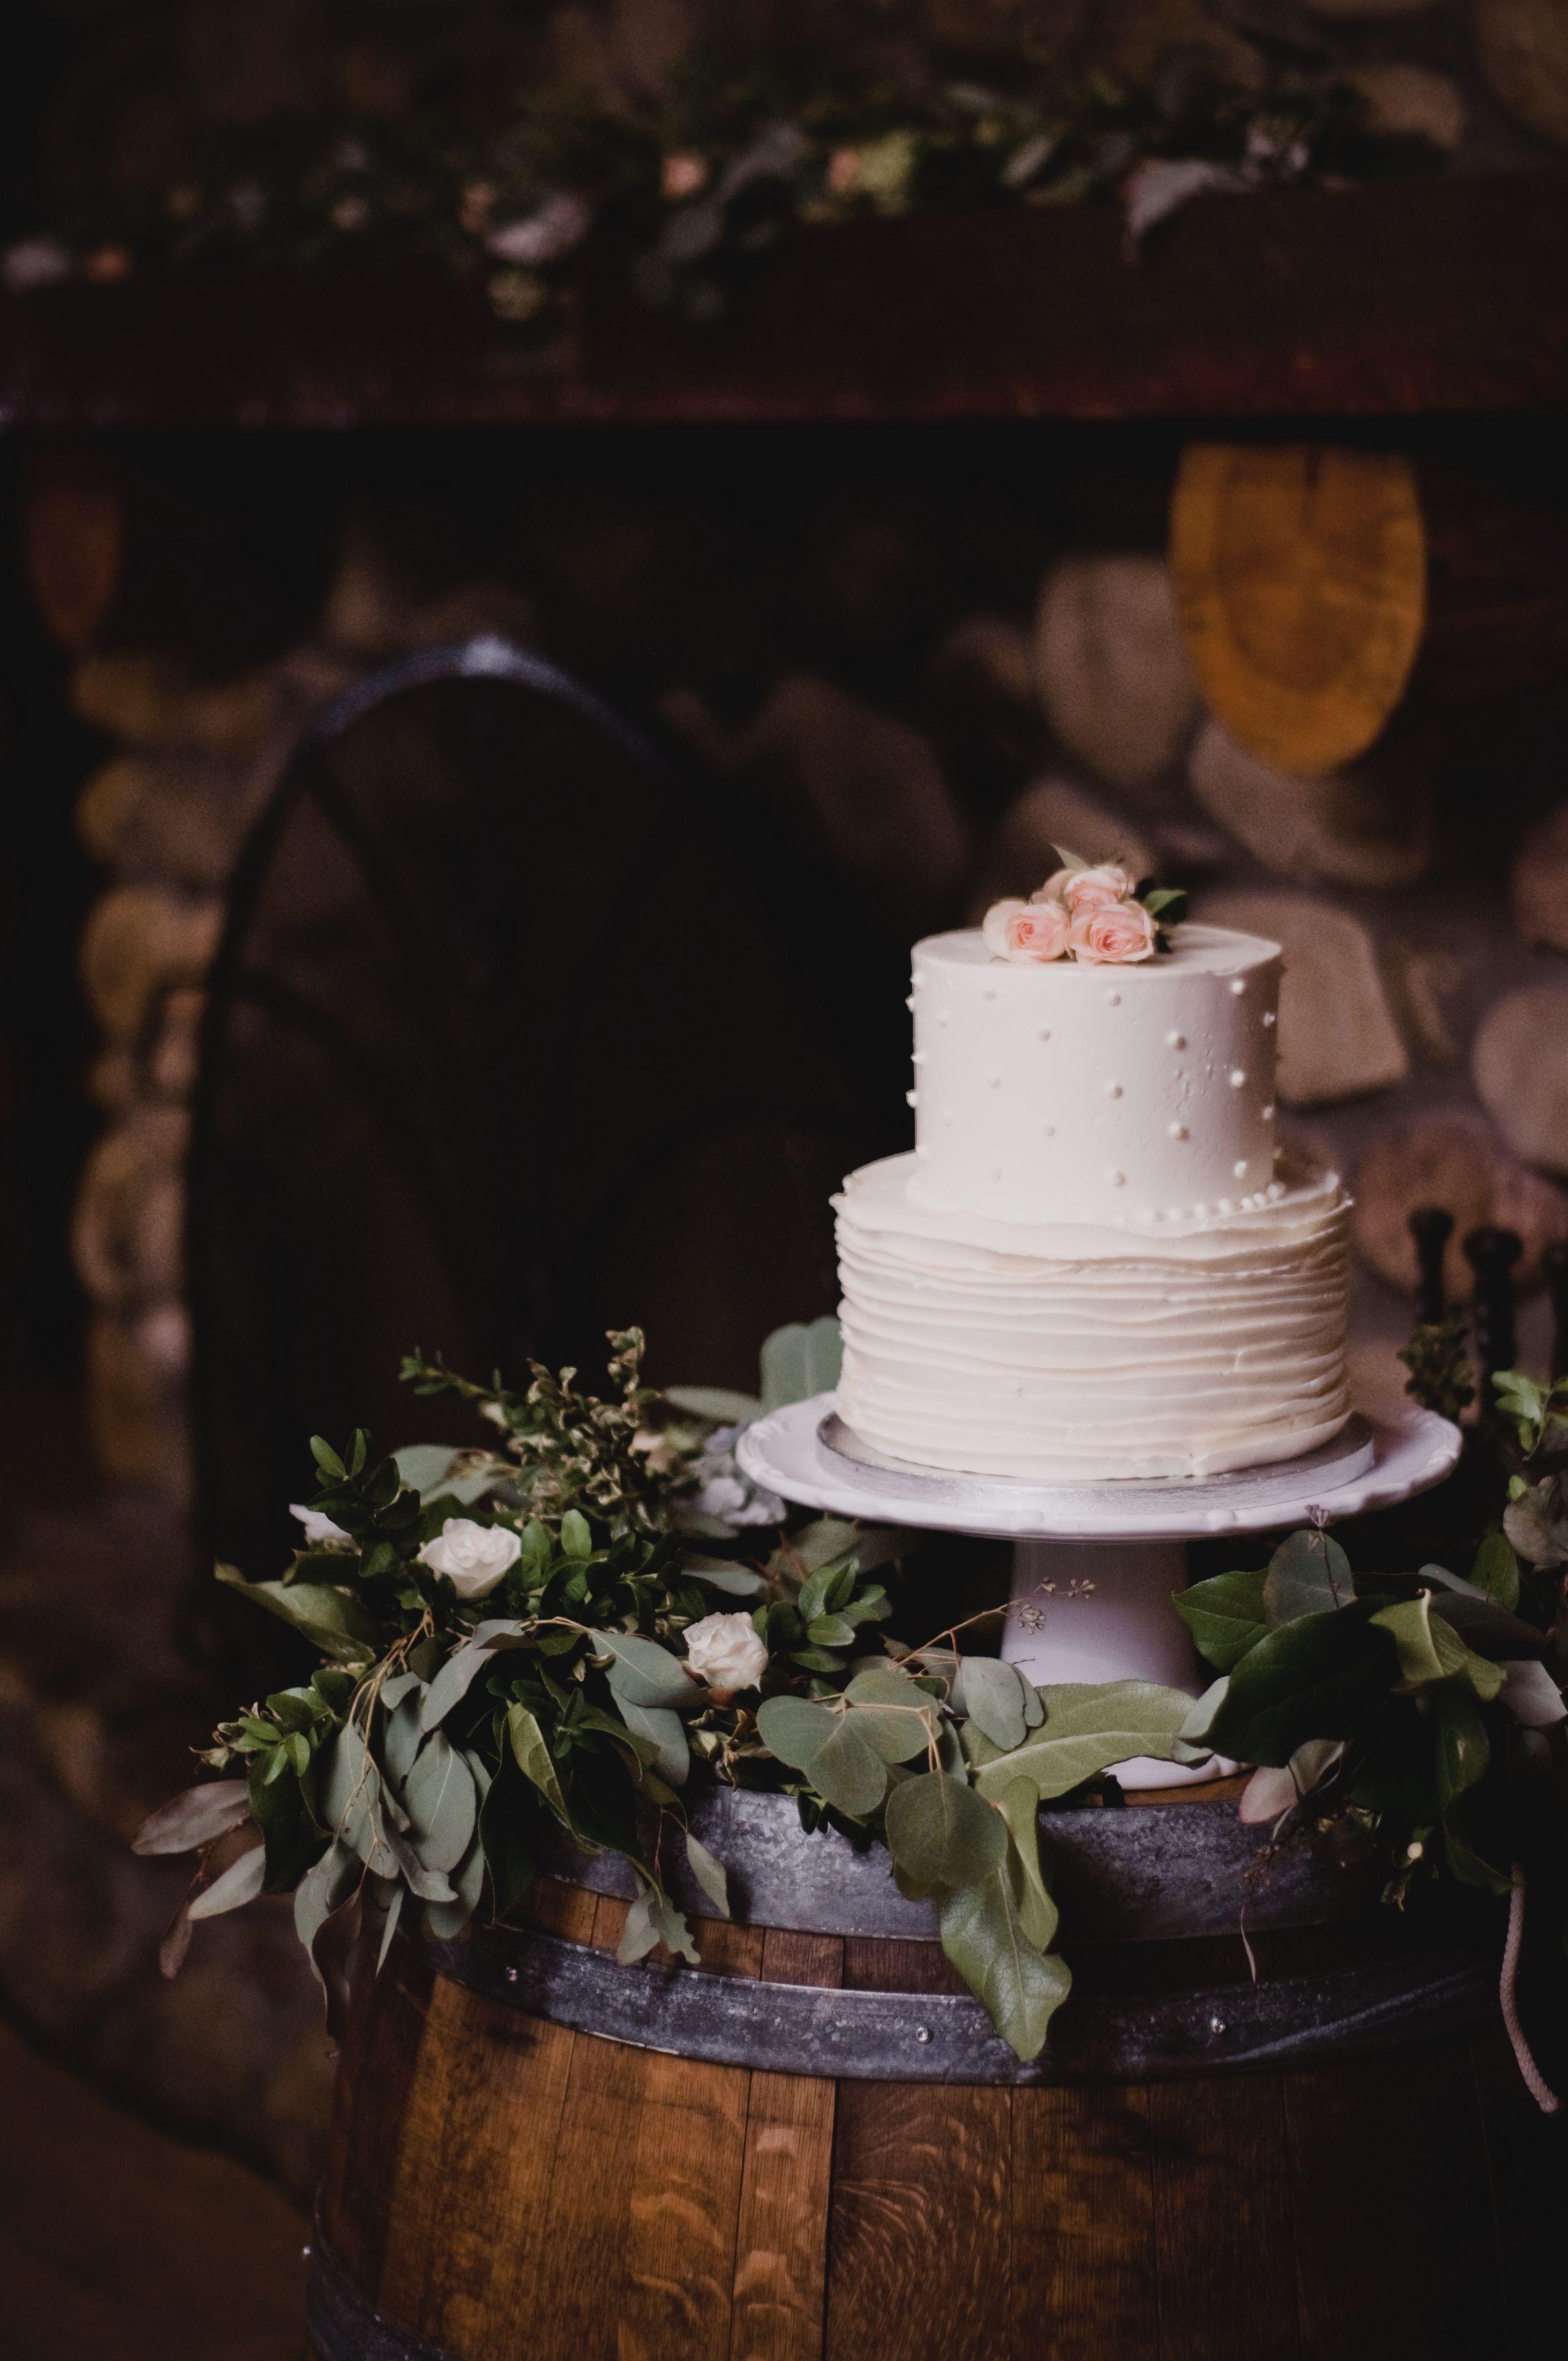 Wedding cake table decoration ideas  Wine barrel wedding cake table  Wedding  Pinterest  Cake Table